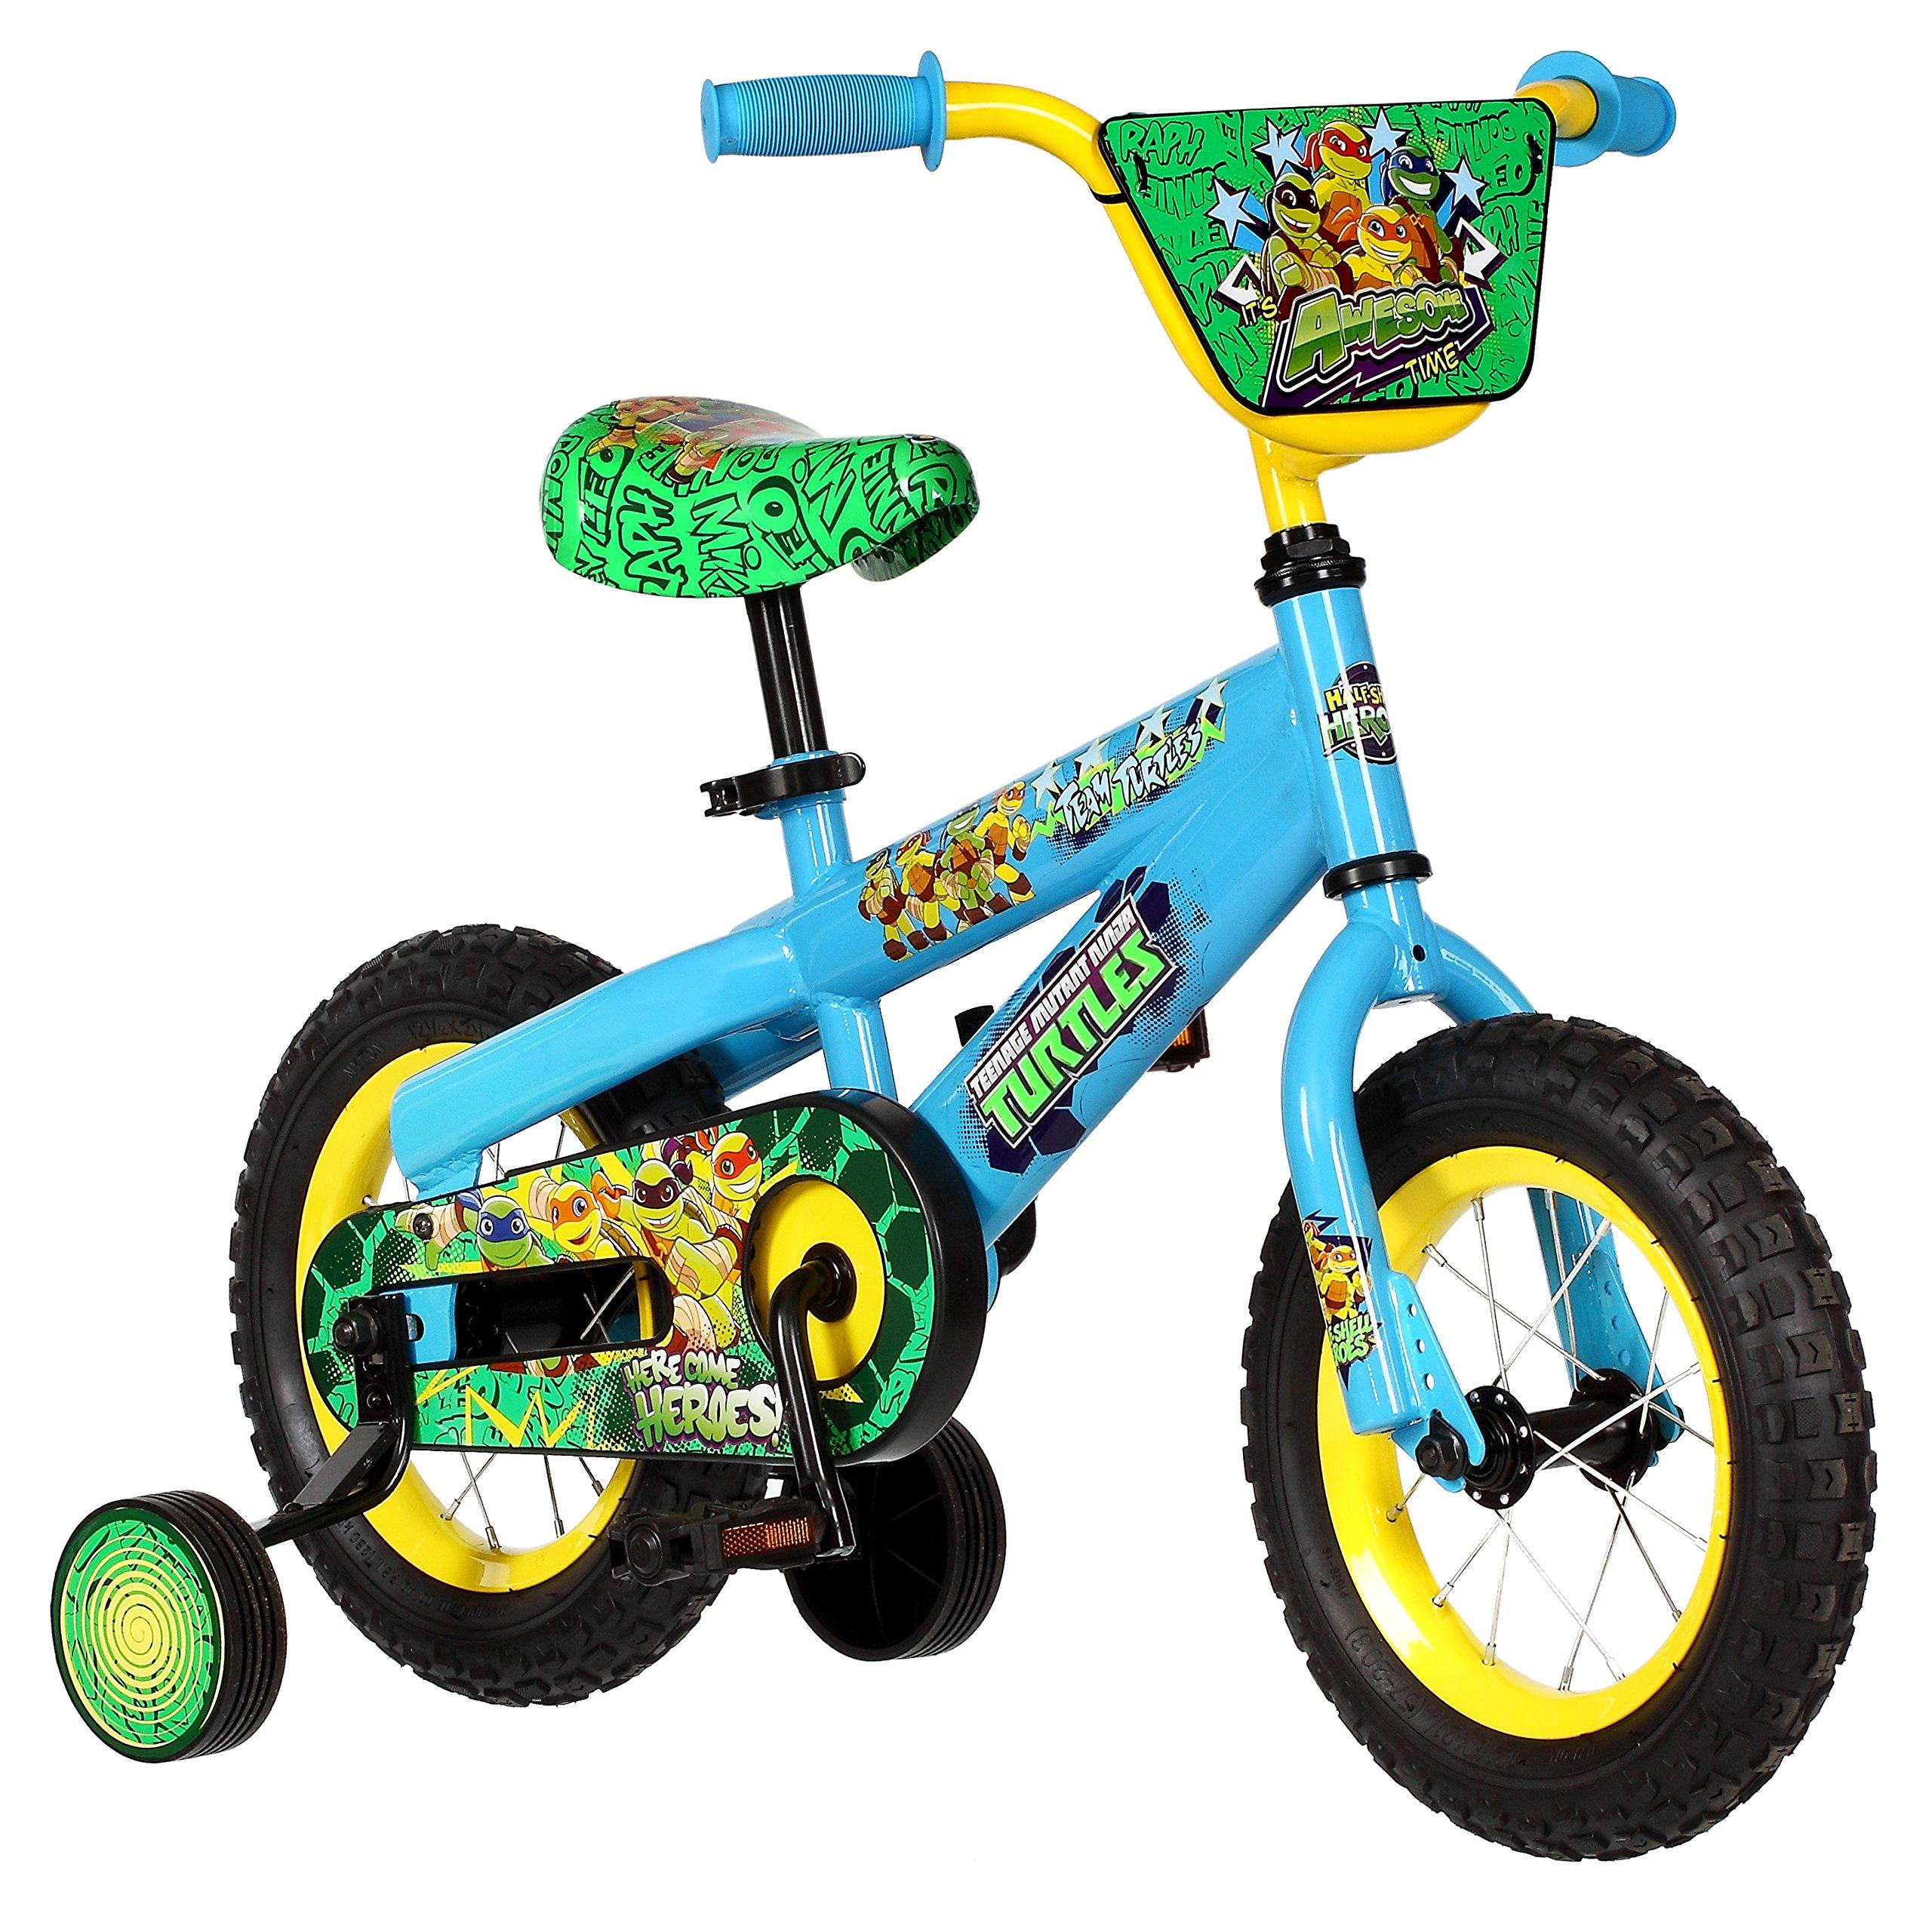 Pacific Cycle Teenage Mutant Ninja Turtles Boys 12'' Bicycle, Blue